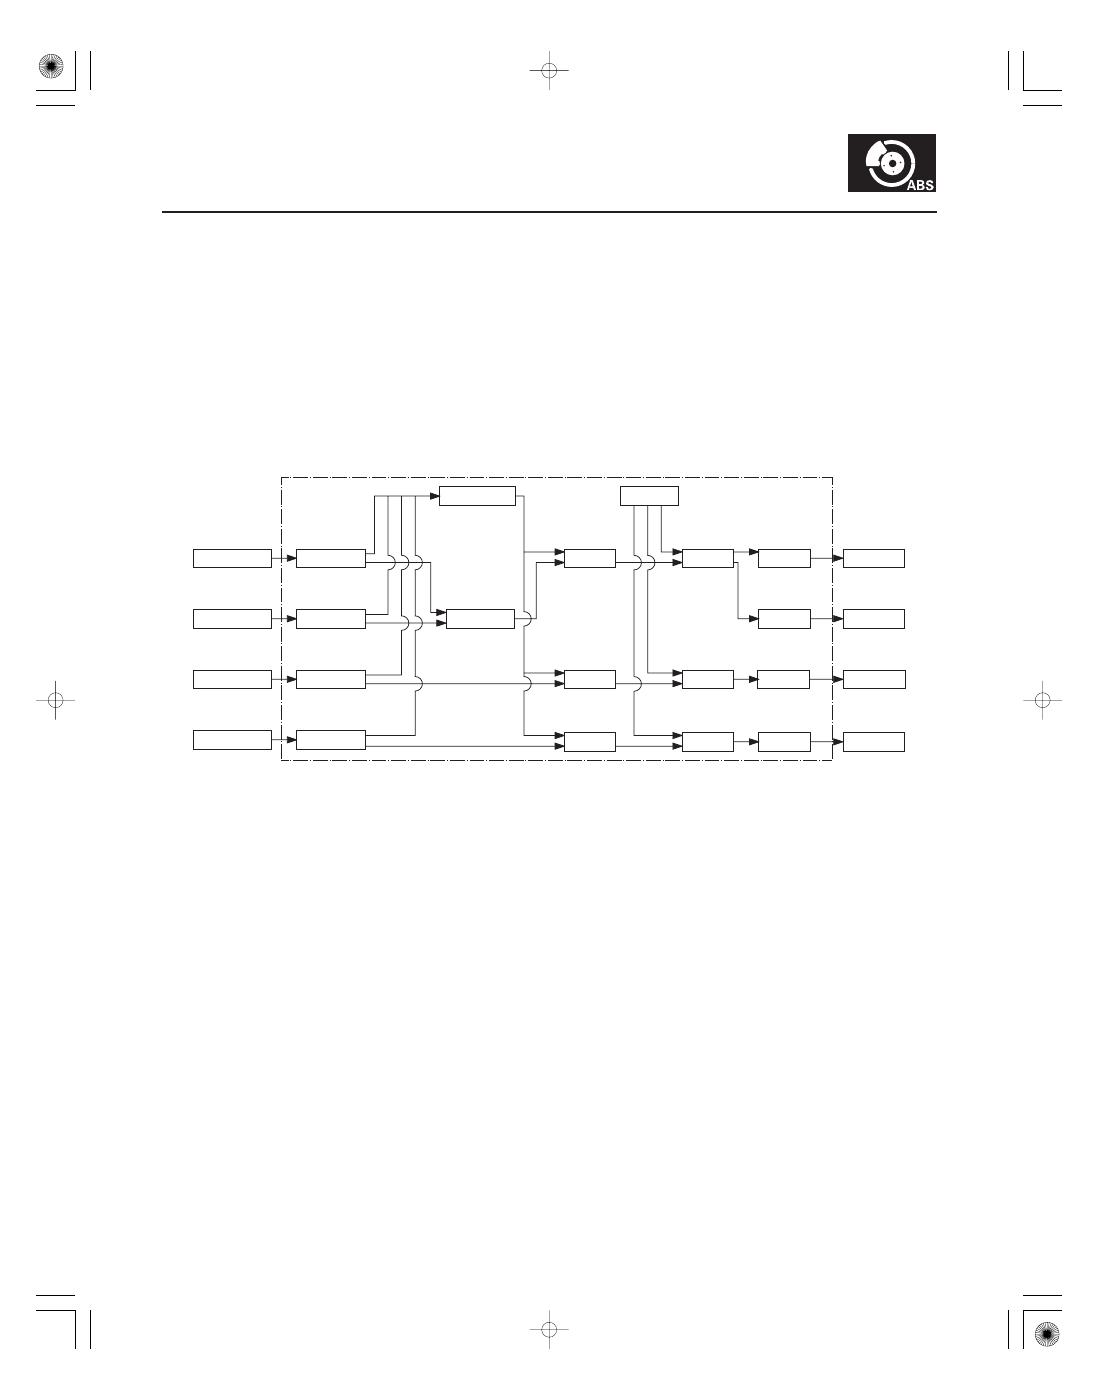 Acura Rsx Honda Integra Manual Part 361 Abs Fuse Box